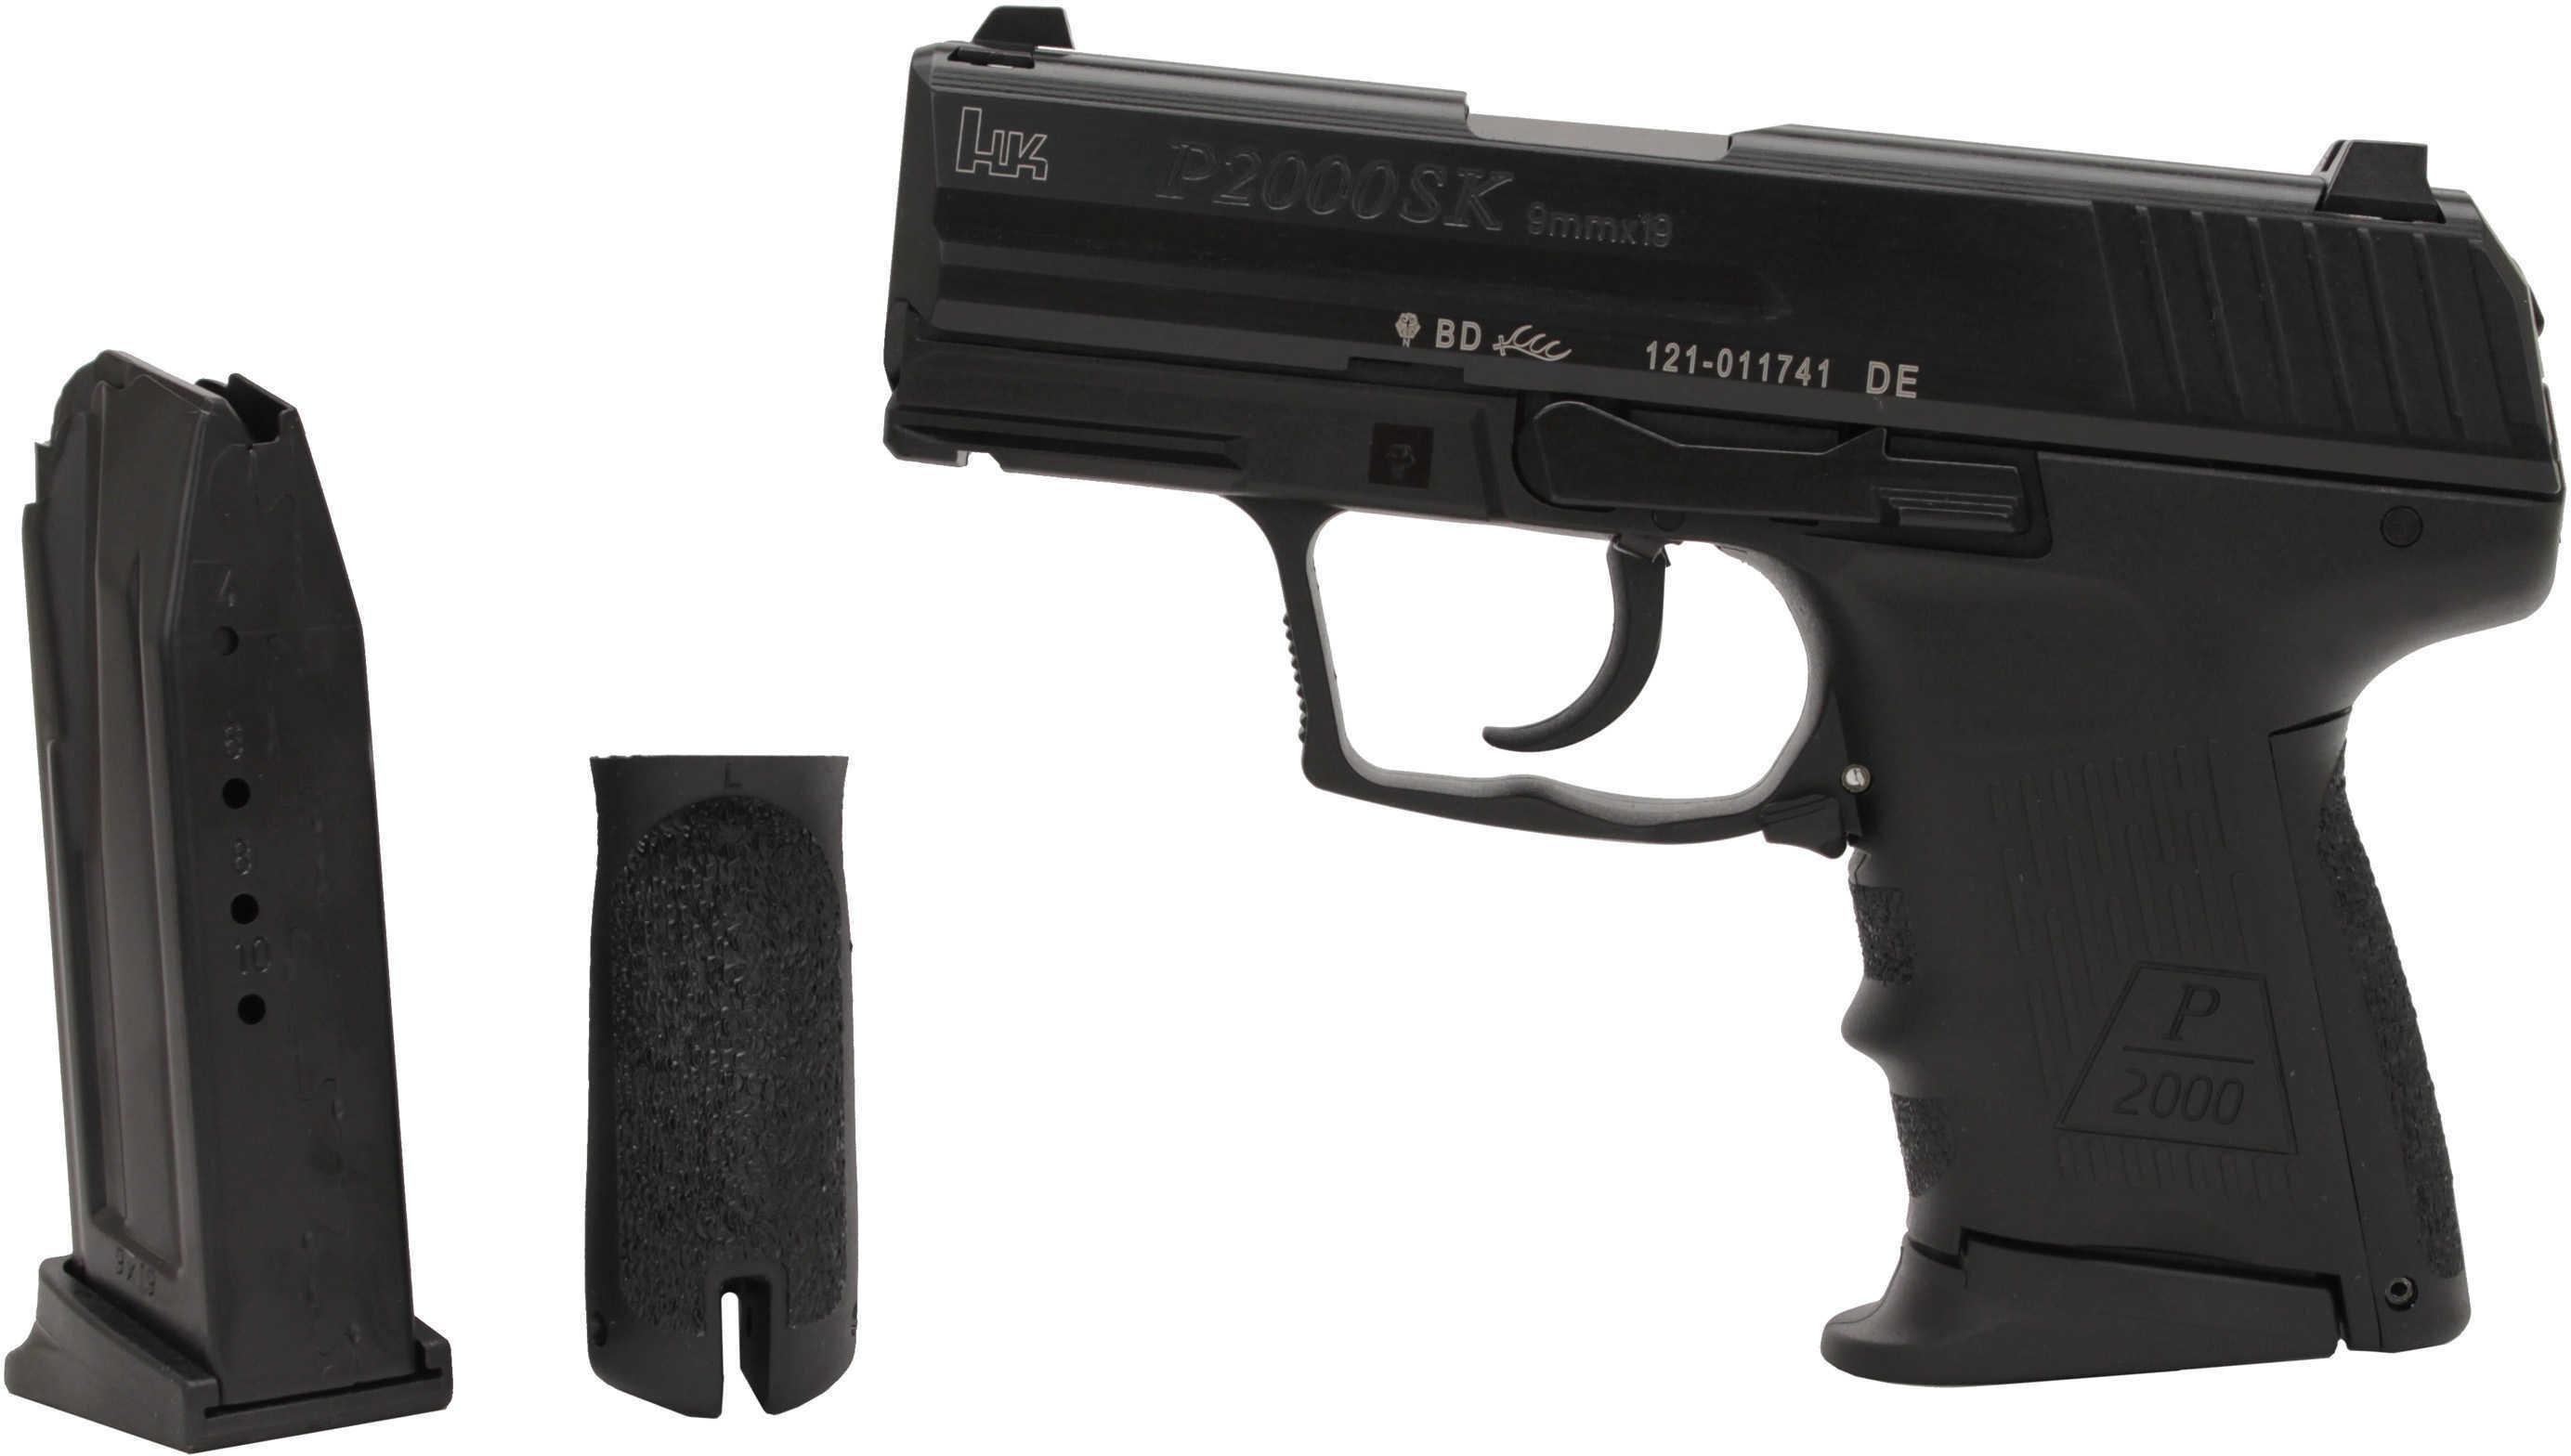 "Heckler & Koch P2000Sk V2 9mm Luger 2.5"" Subcompact 2 10 Round Pistol 709302"